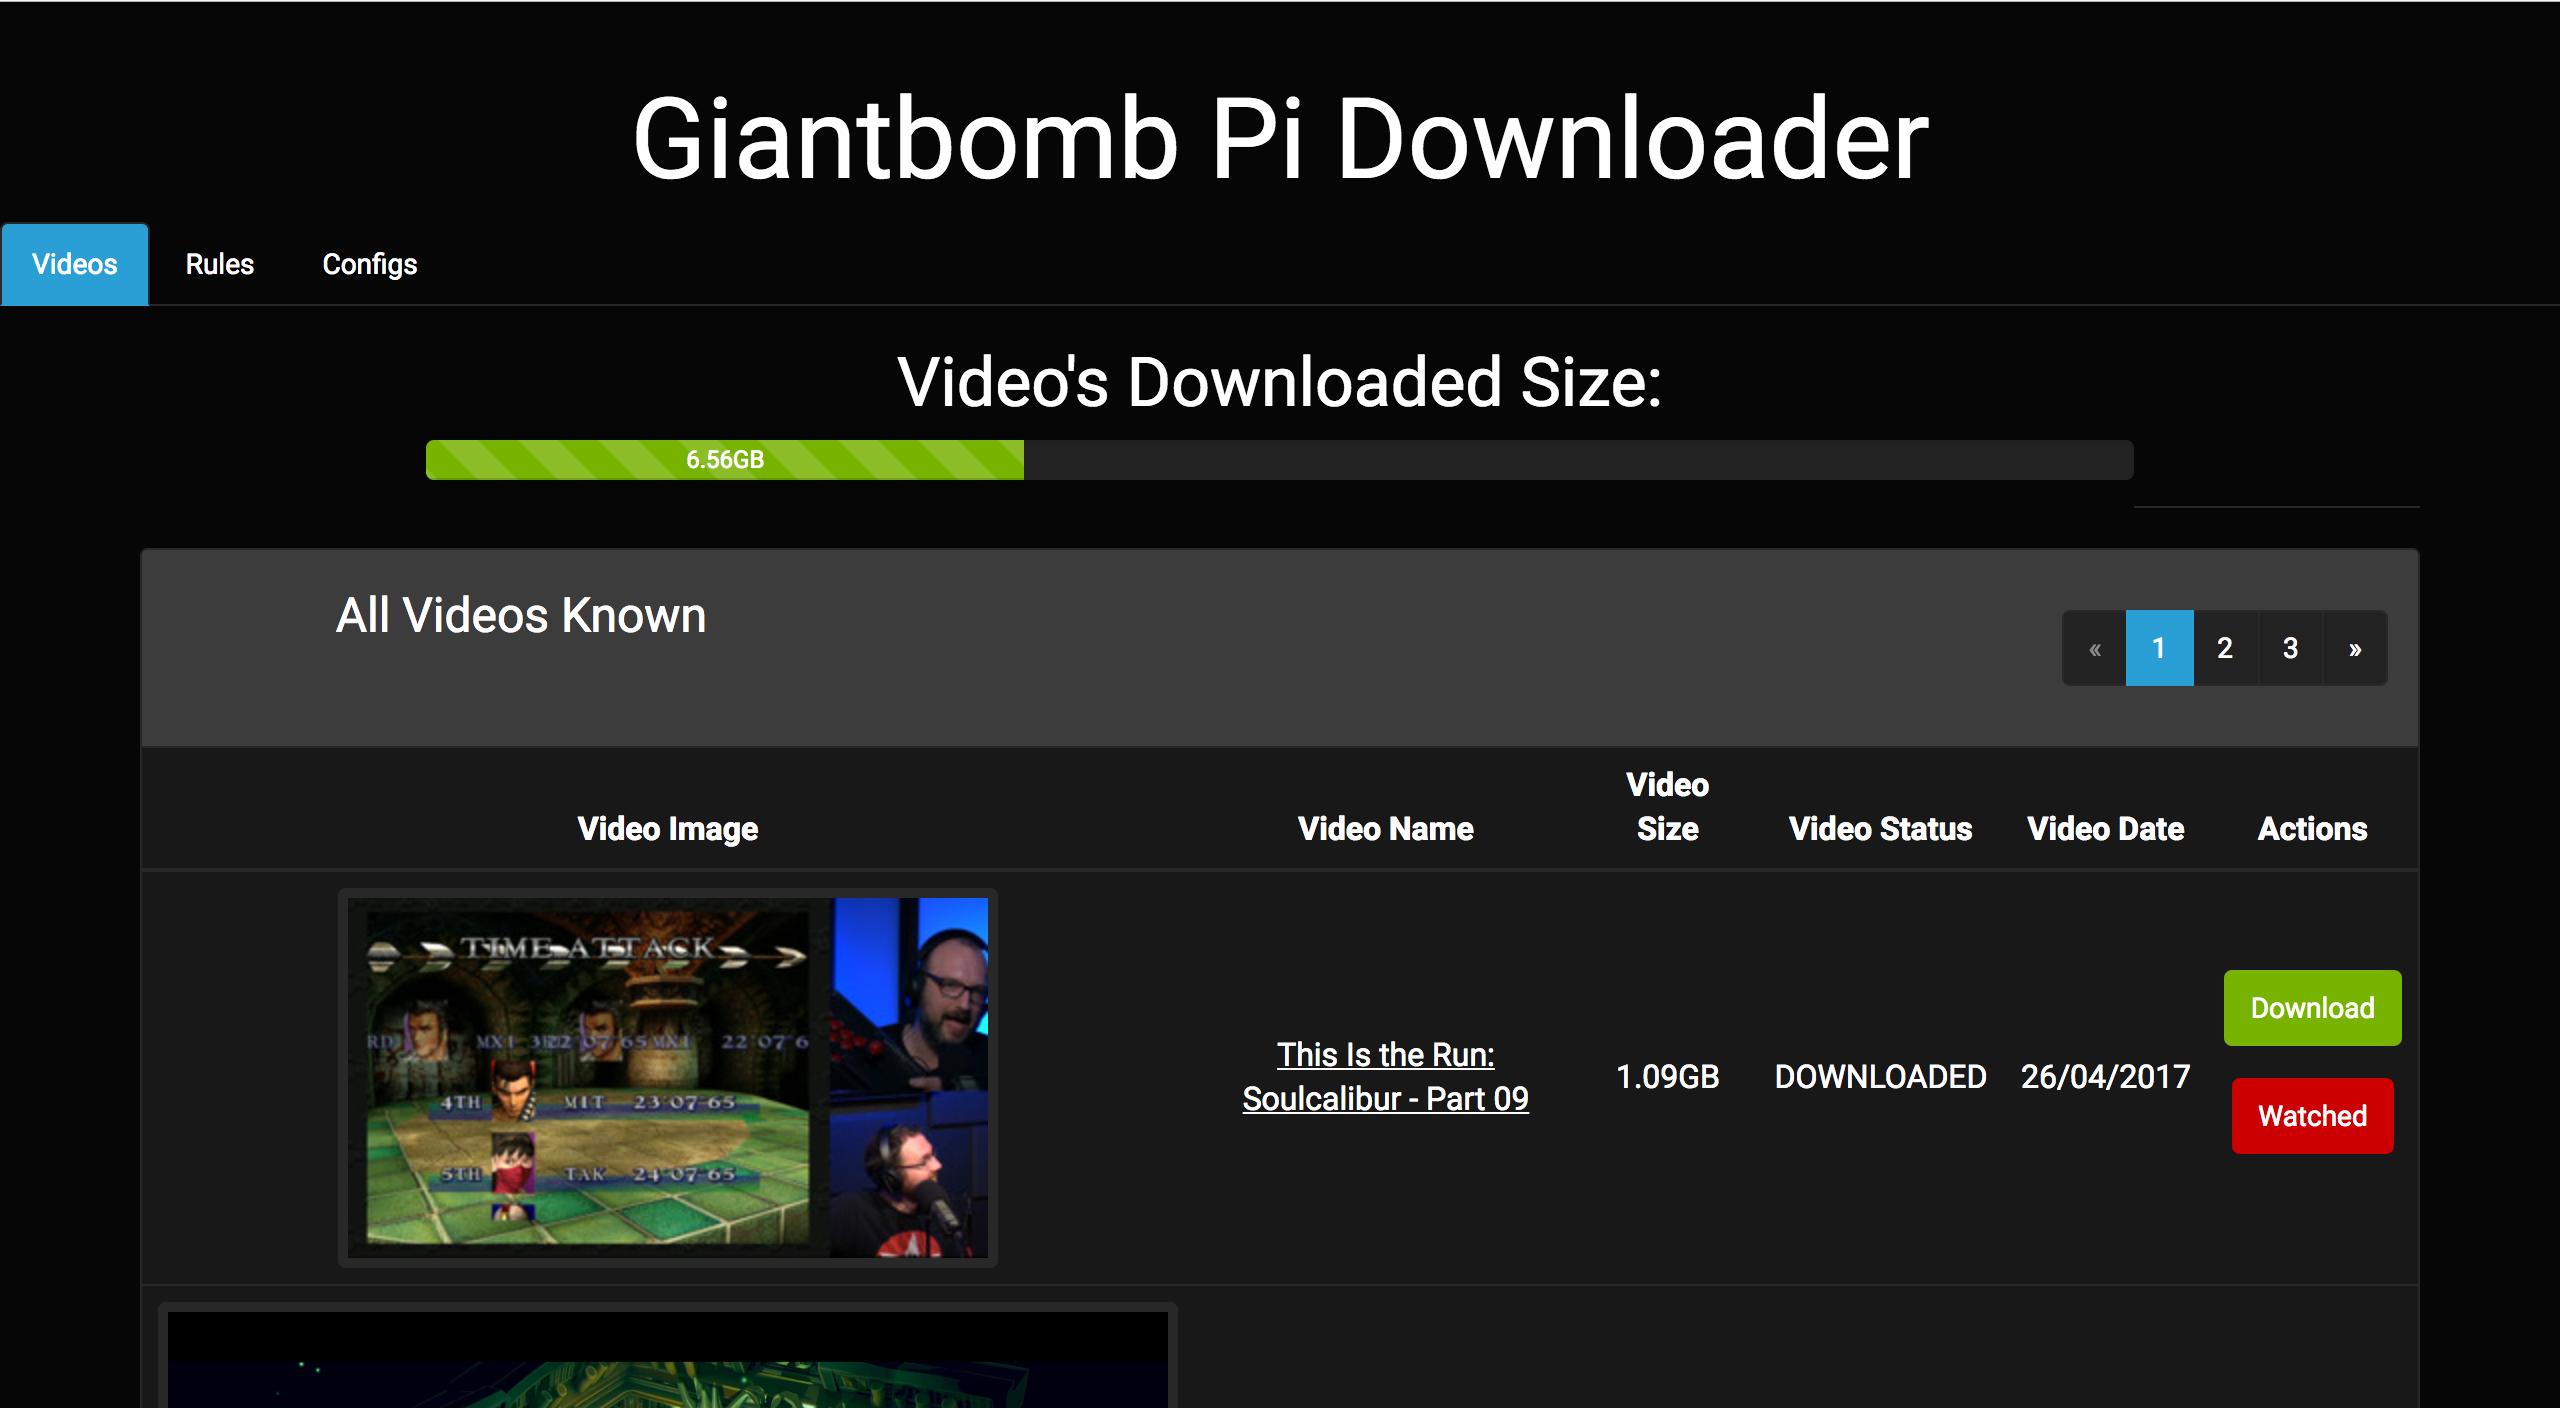 Giantbomb Pi Downloader Front Page